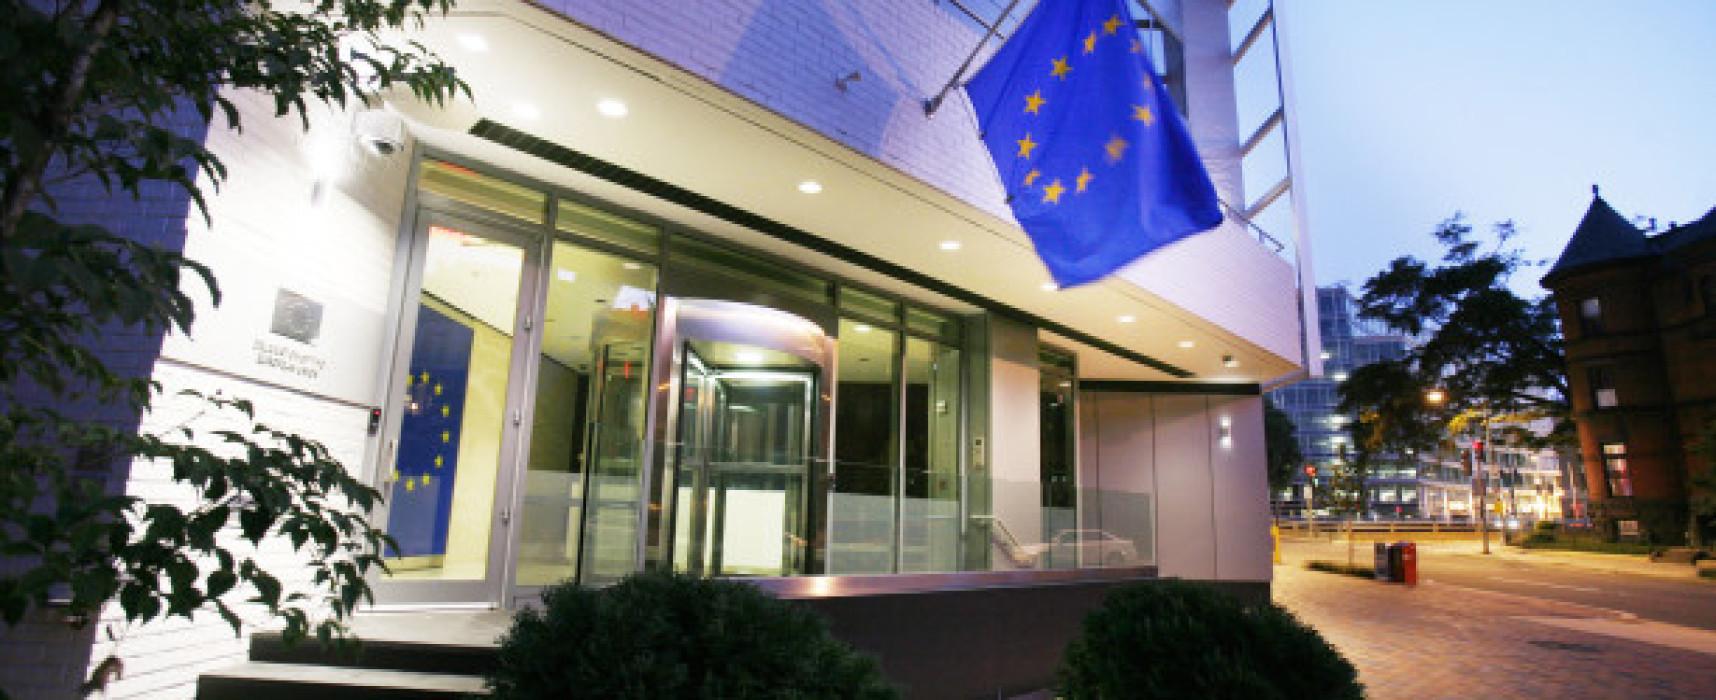 Tirocini NON retribuiti presso la EU Delegation to the USA (Washington)